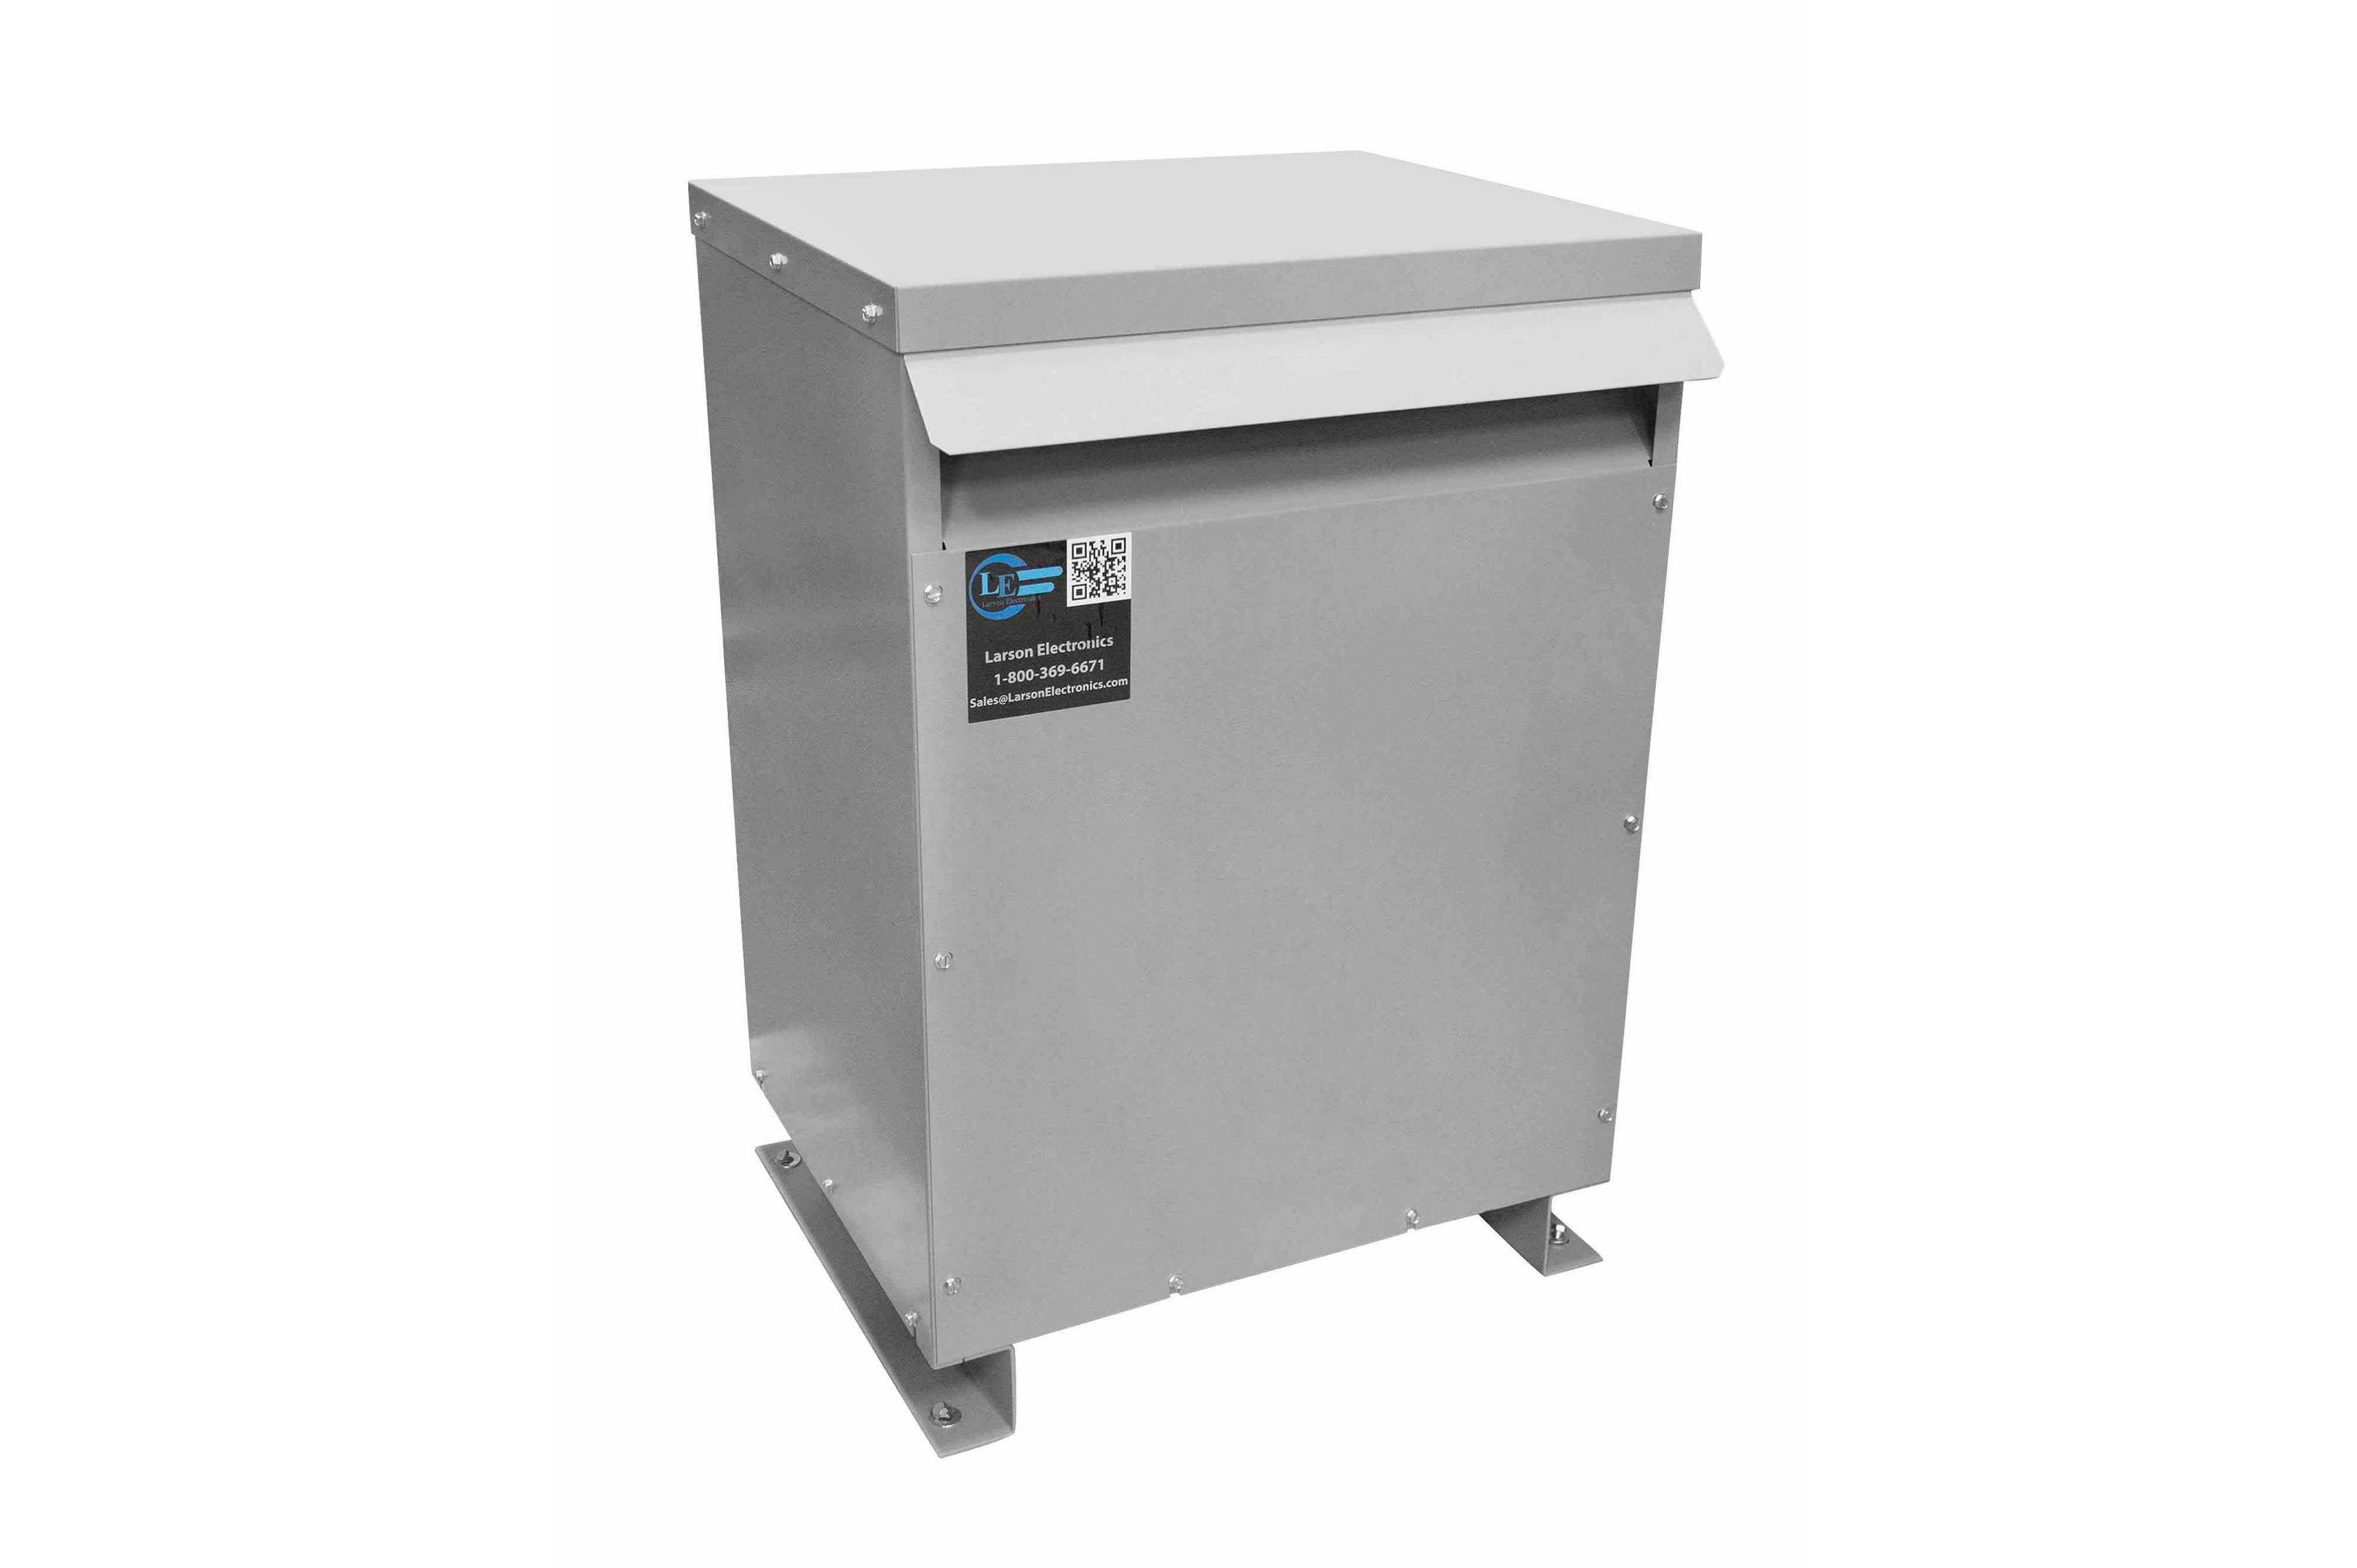 29 kVA 3PH Isolation Transformer, 208V Wye Primary, 600V Delta Secondary, N3R, Ventilated, 60 Hz